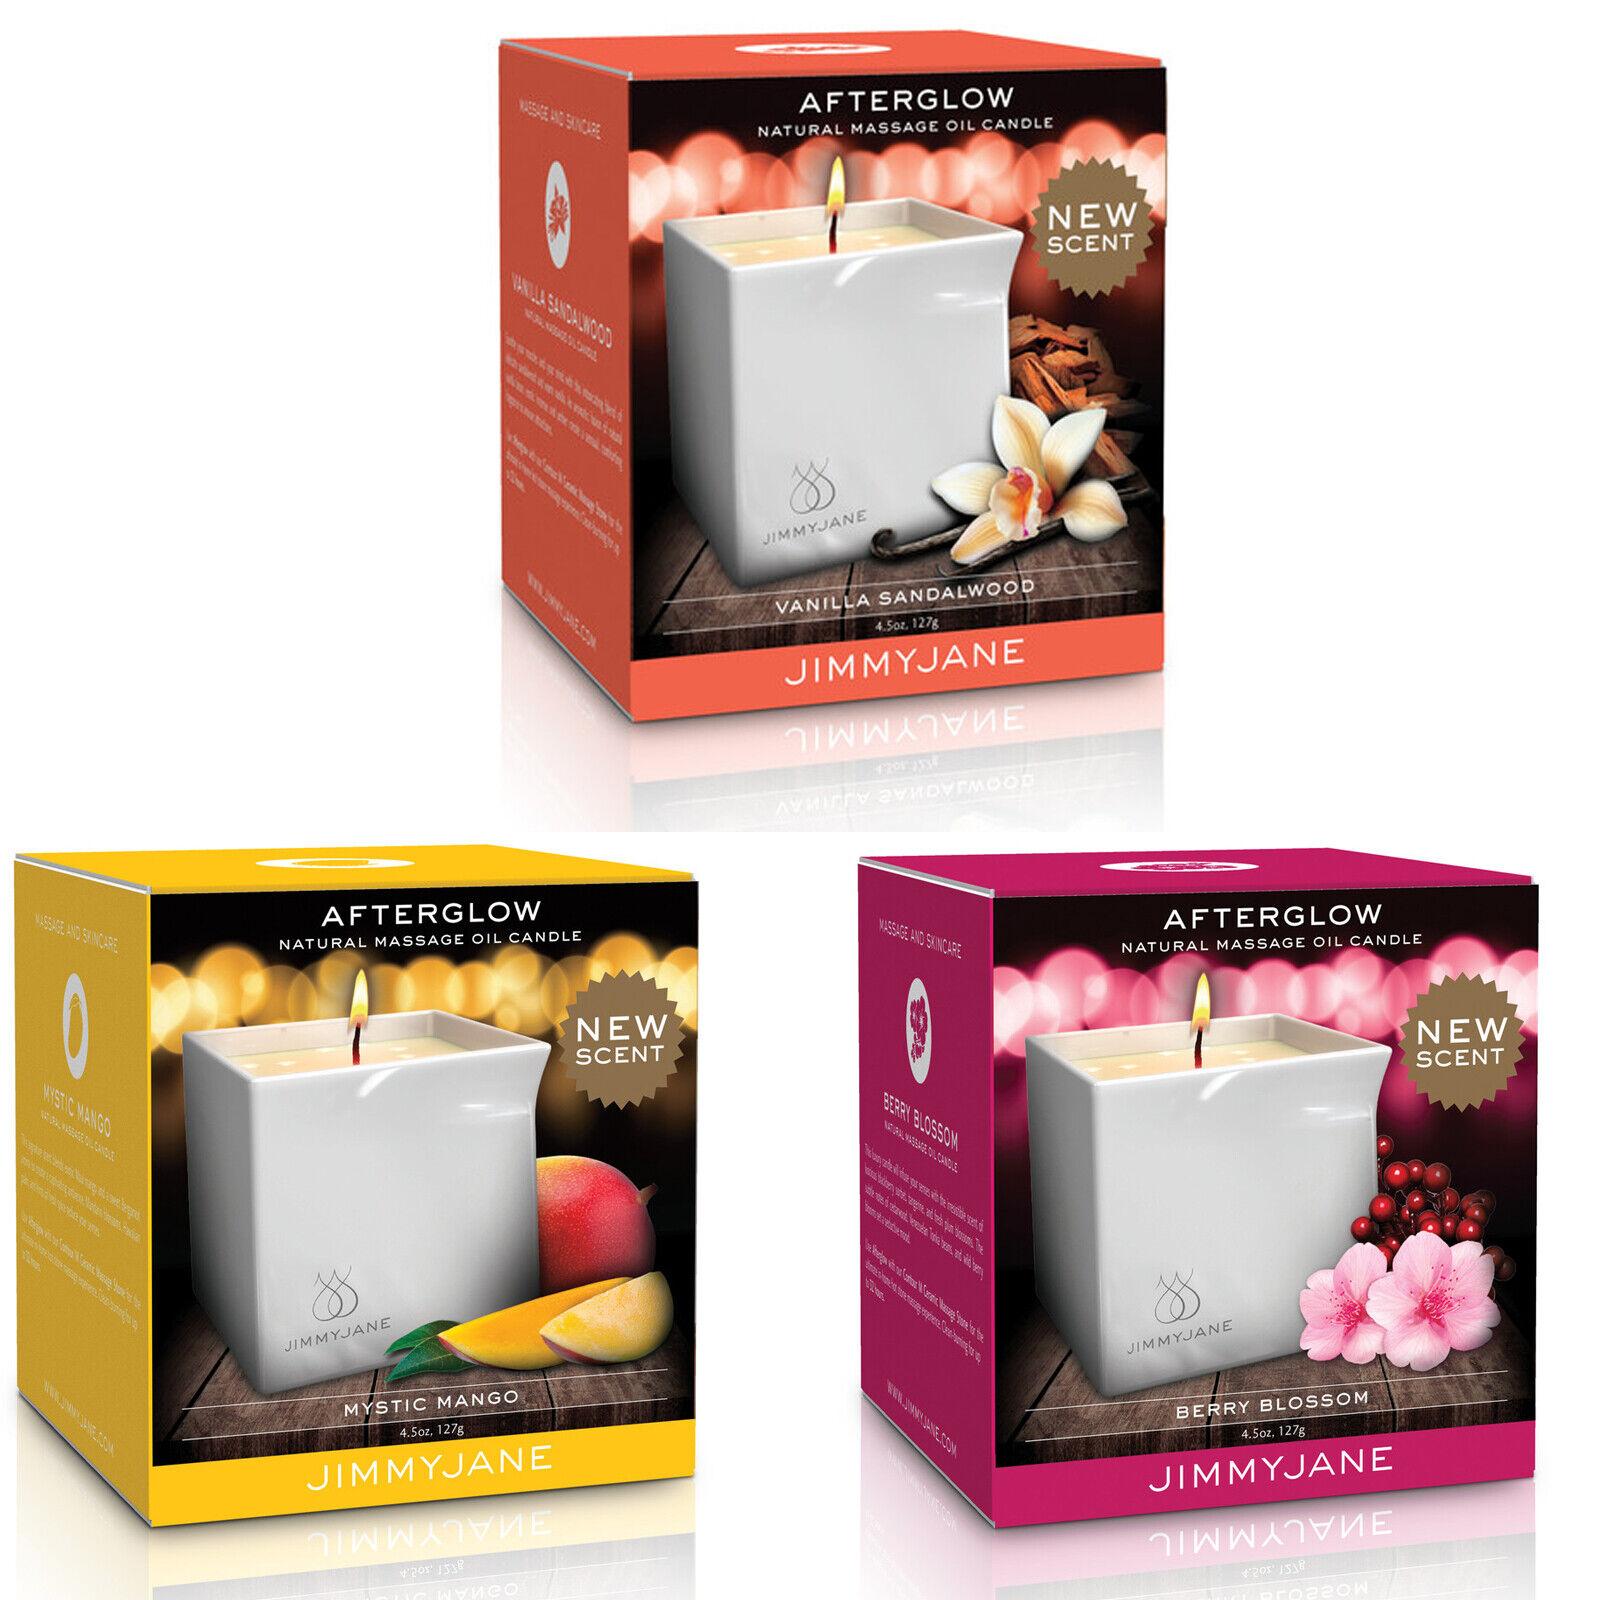 JimmyJane Afterglow Massage Candle Vanilla Sandalwood Berry